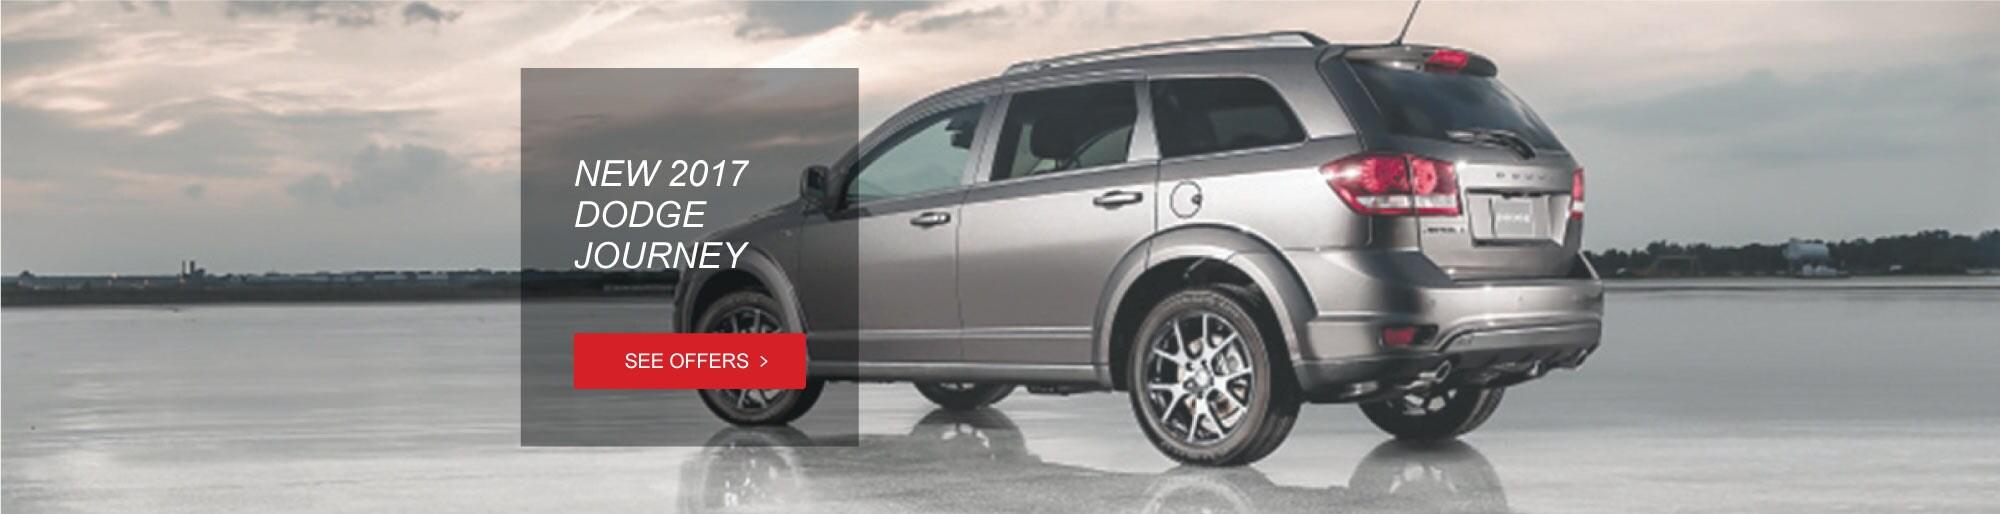 Lithia Dodge Medford >> Lithia Dodge Medford Upcoming Auto Car Release Date